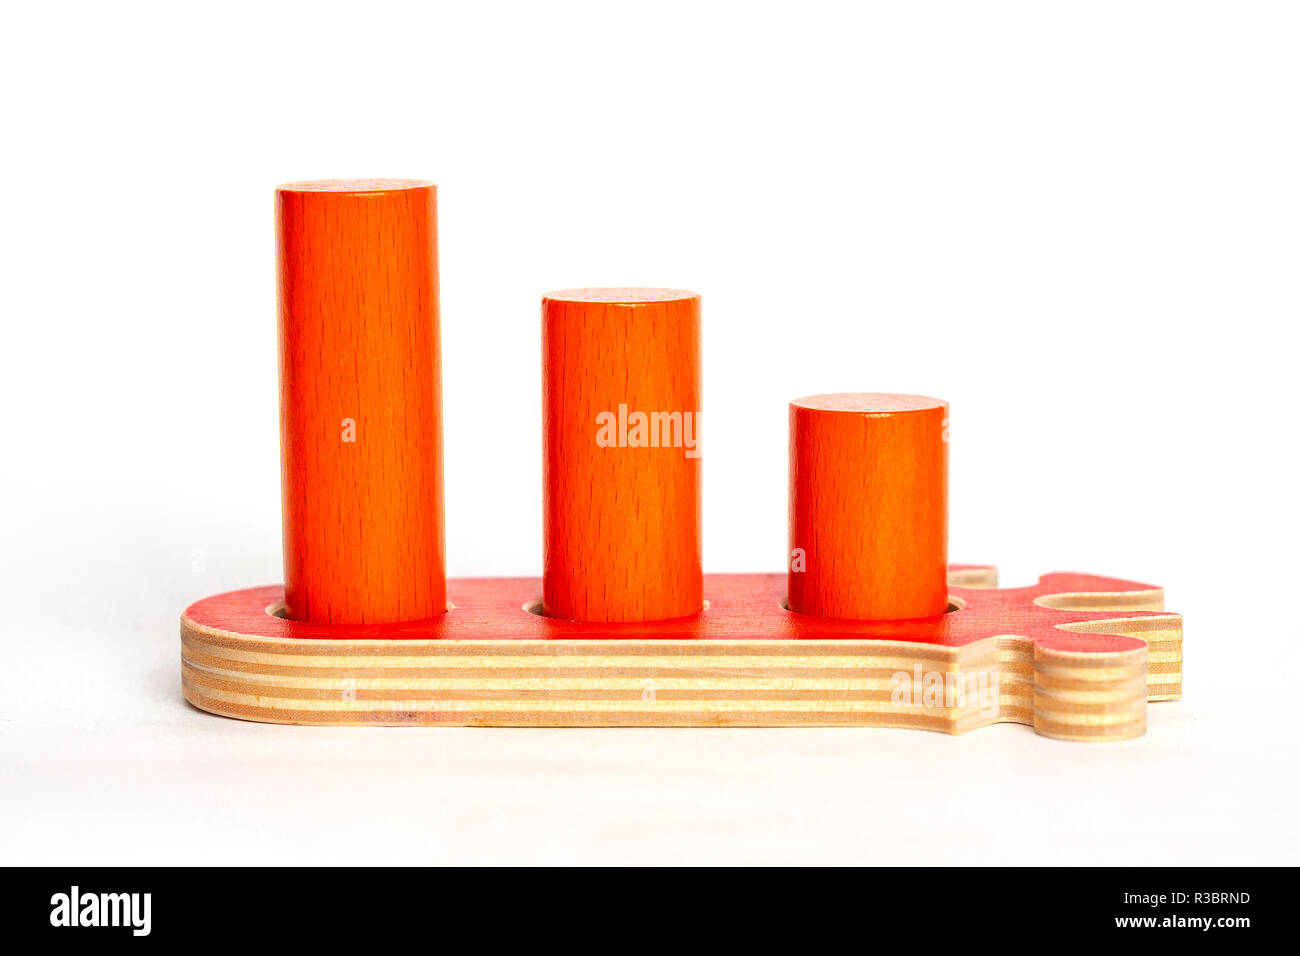 Orange puzzle. Career growth, personality development Child Game - Stock Image